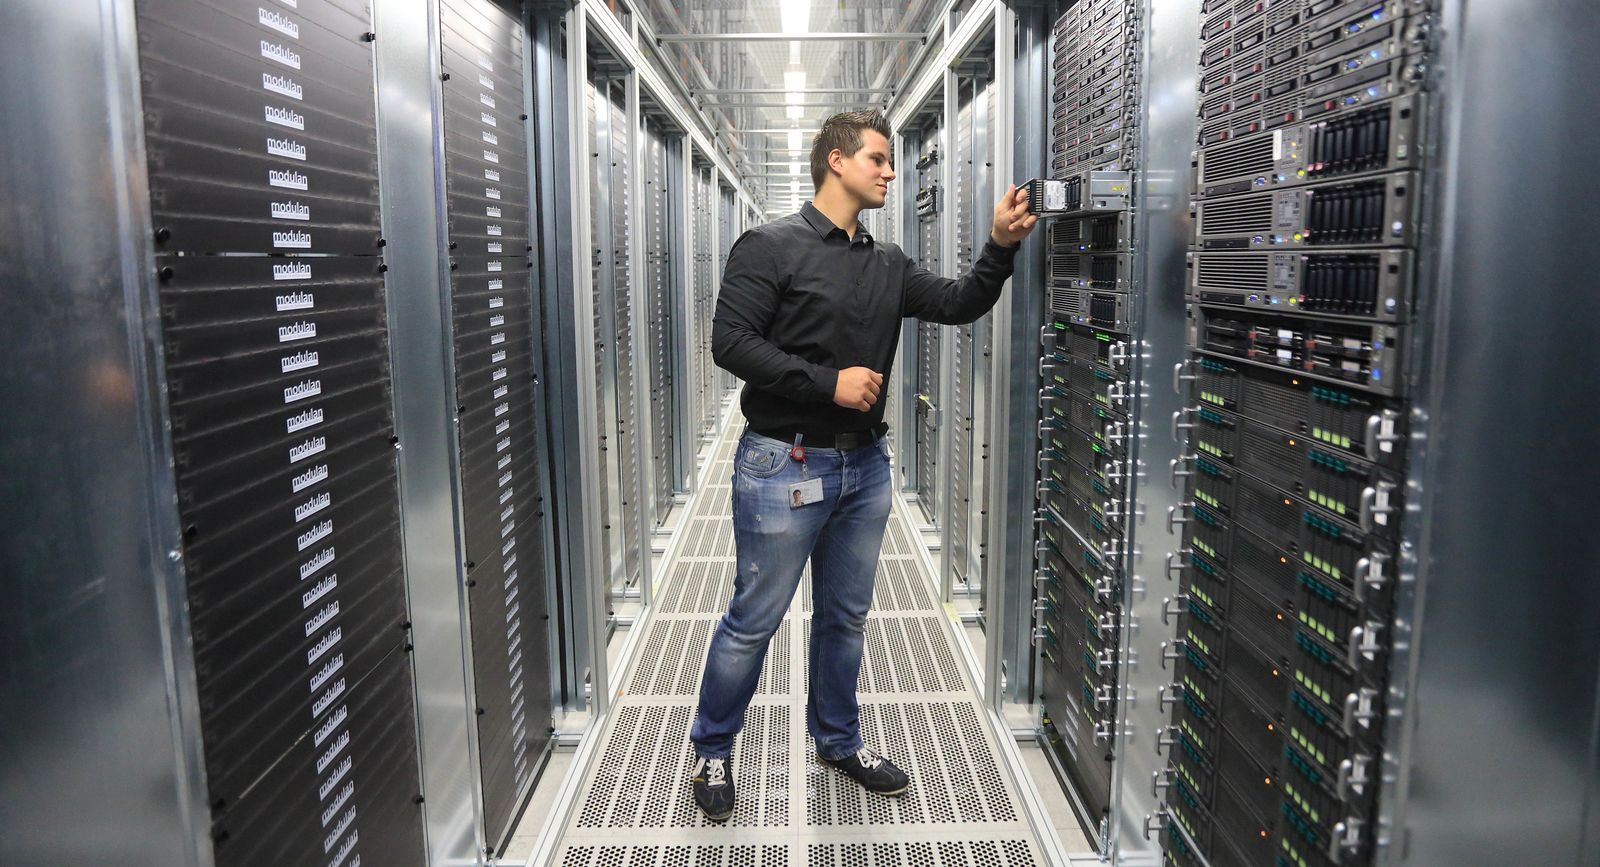 Telekom / IT / Server / Mitarbeiter / Fachkraft